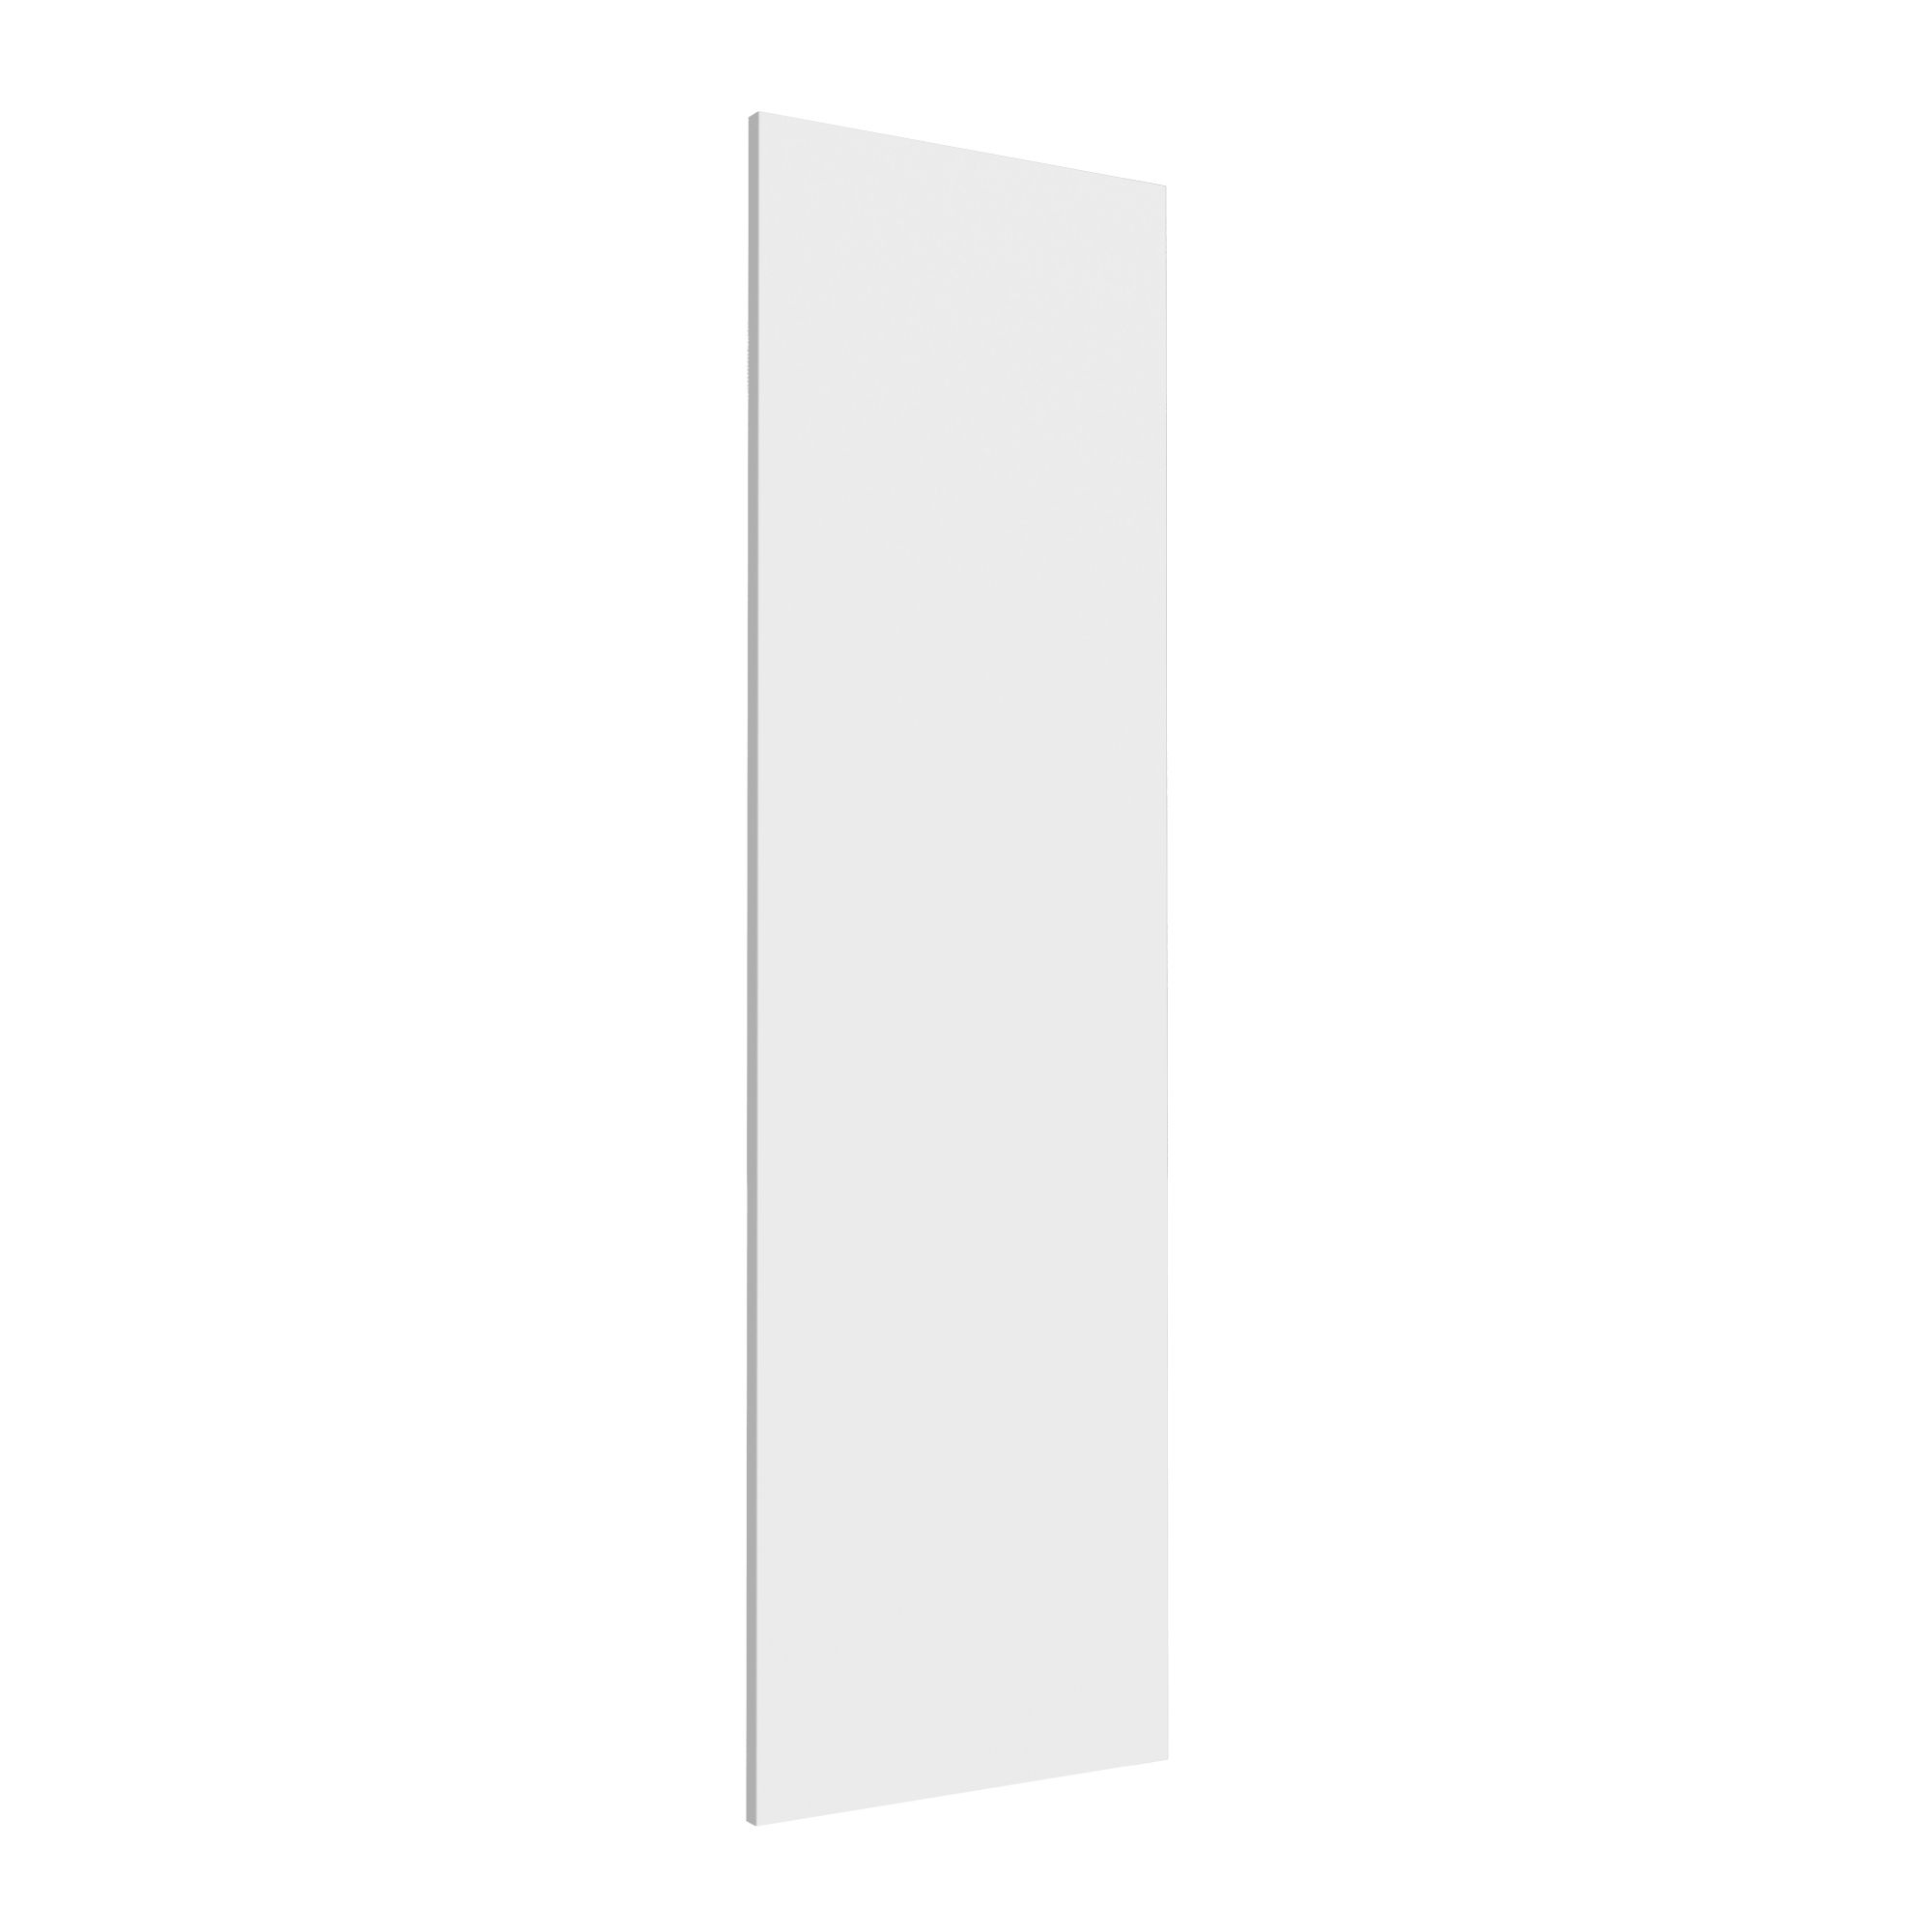 Darwin Modular White & Matt Wardrobe Door (h)1456mm (w)372mm (d)16mm